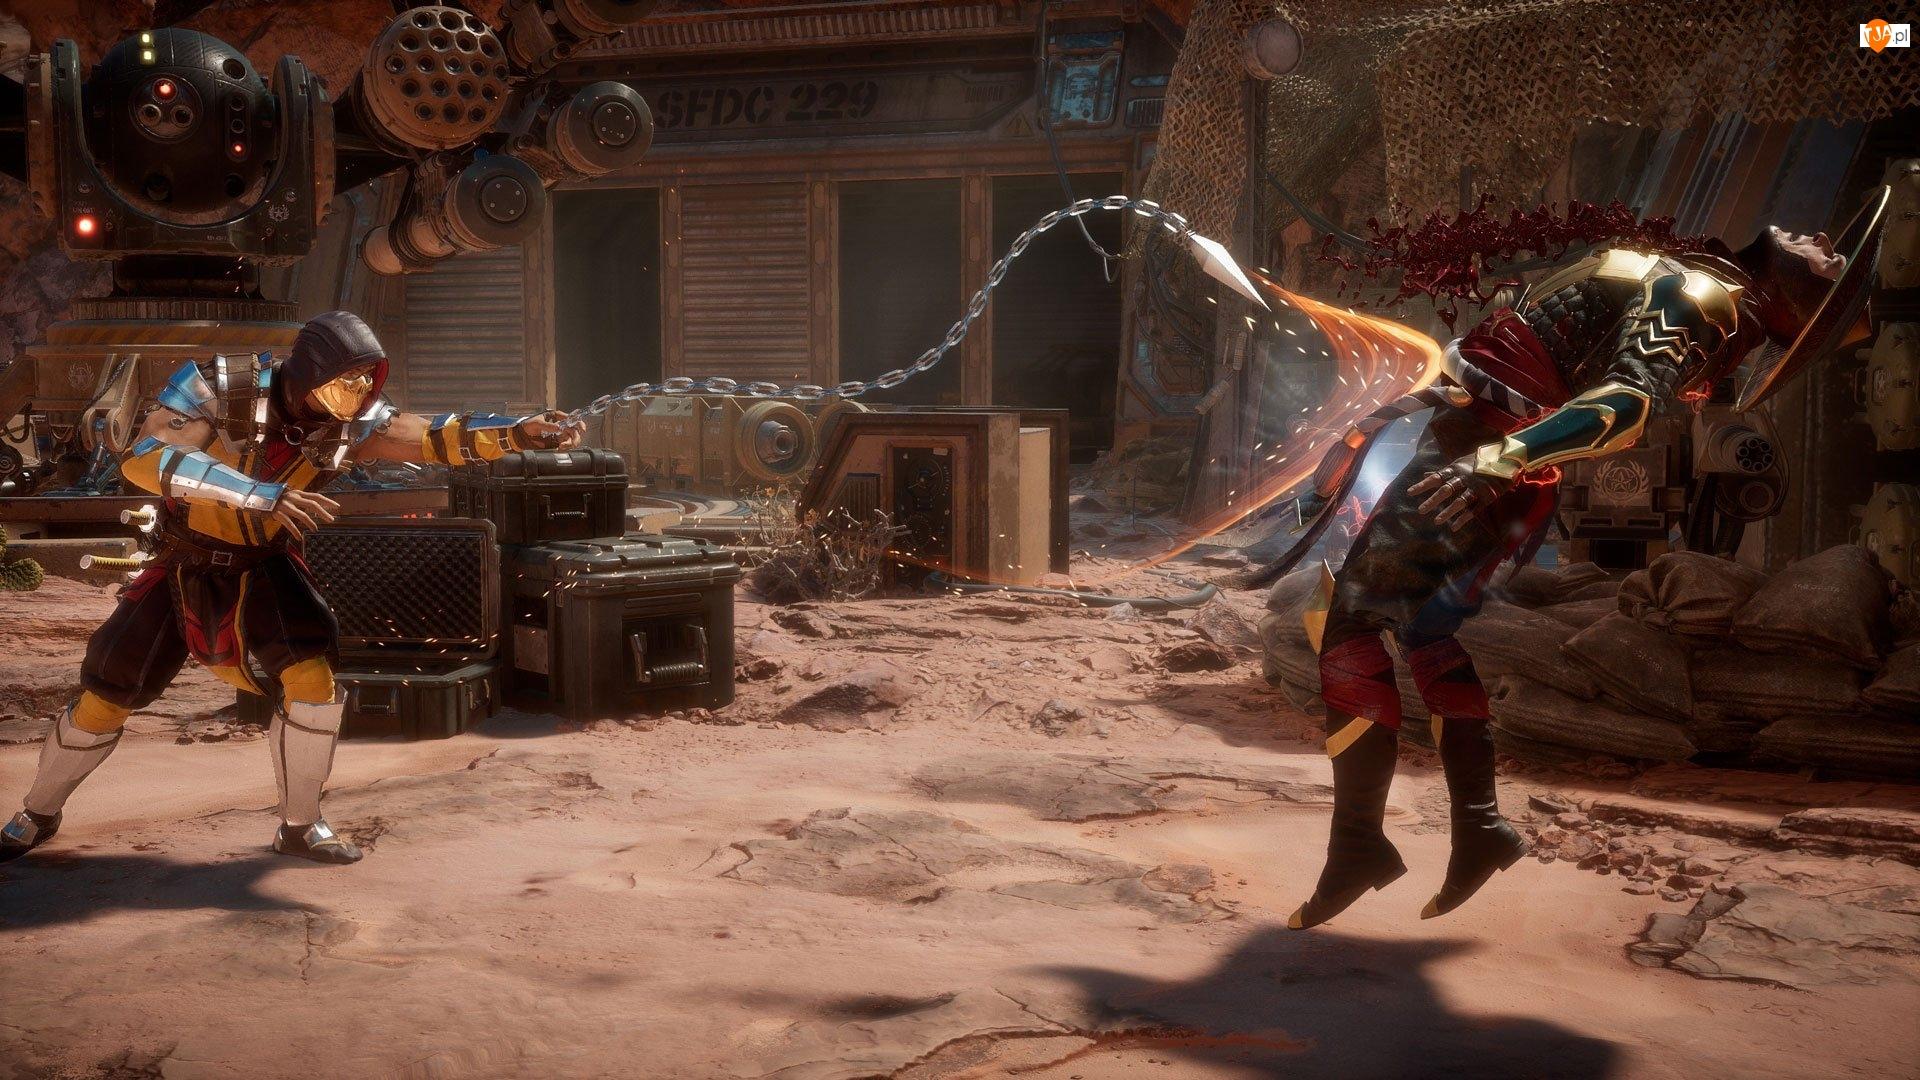 Walka, Mortal Kombat 11, Raiden, Scorpion